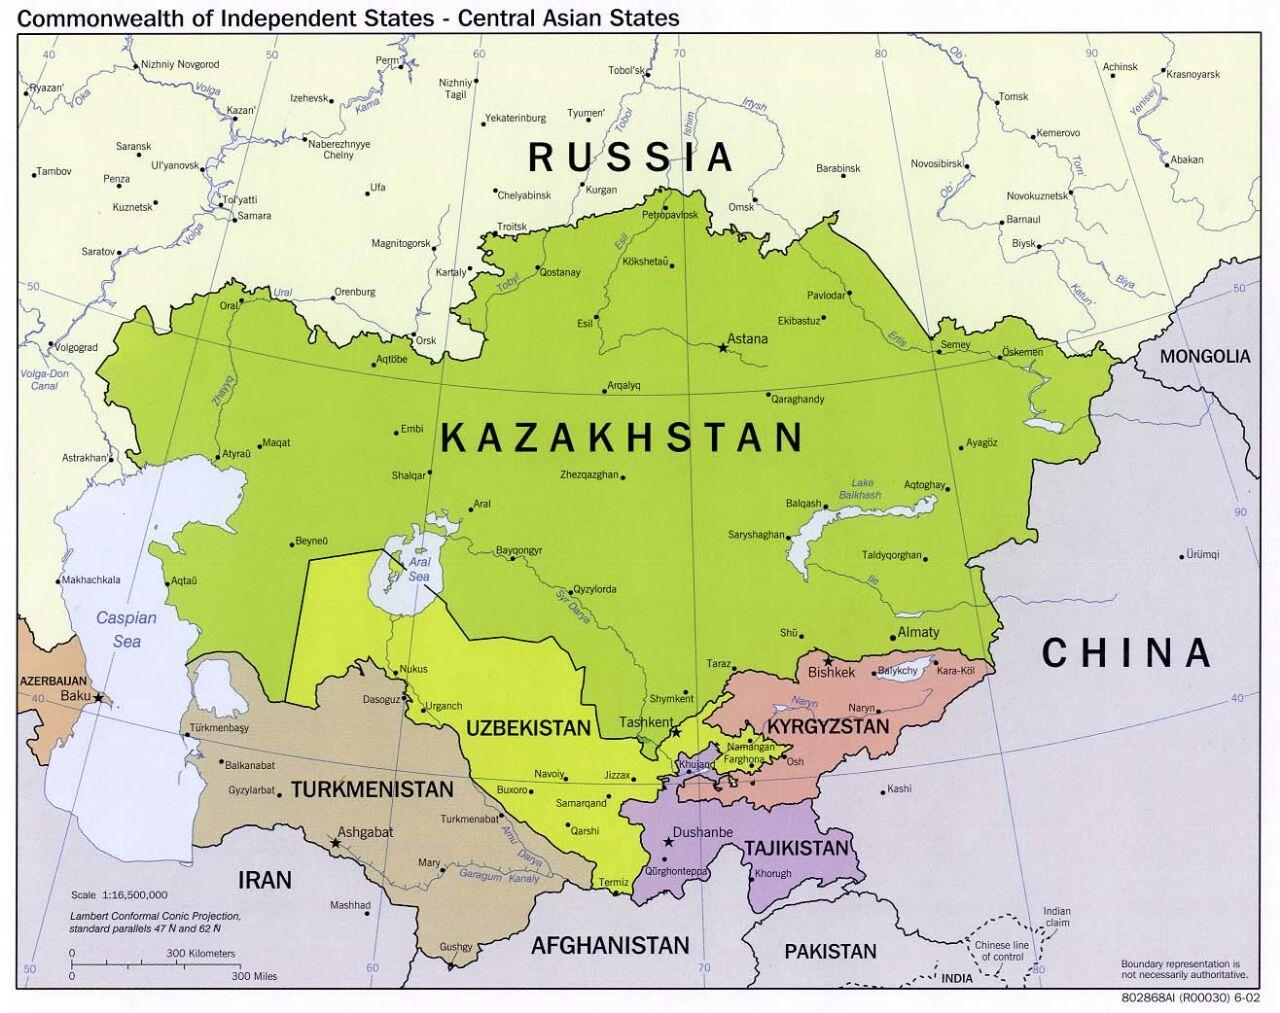 uzbekistan karta Uzbekistan karta Azije   Uzbekistan karta Rusije (Središnja Azija  uzbekistan karta